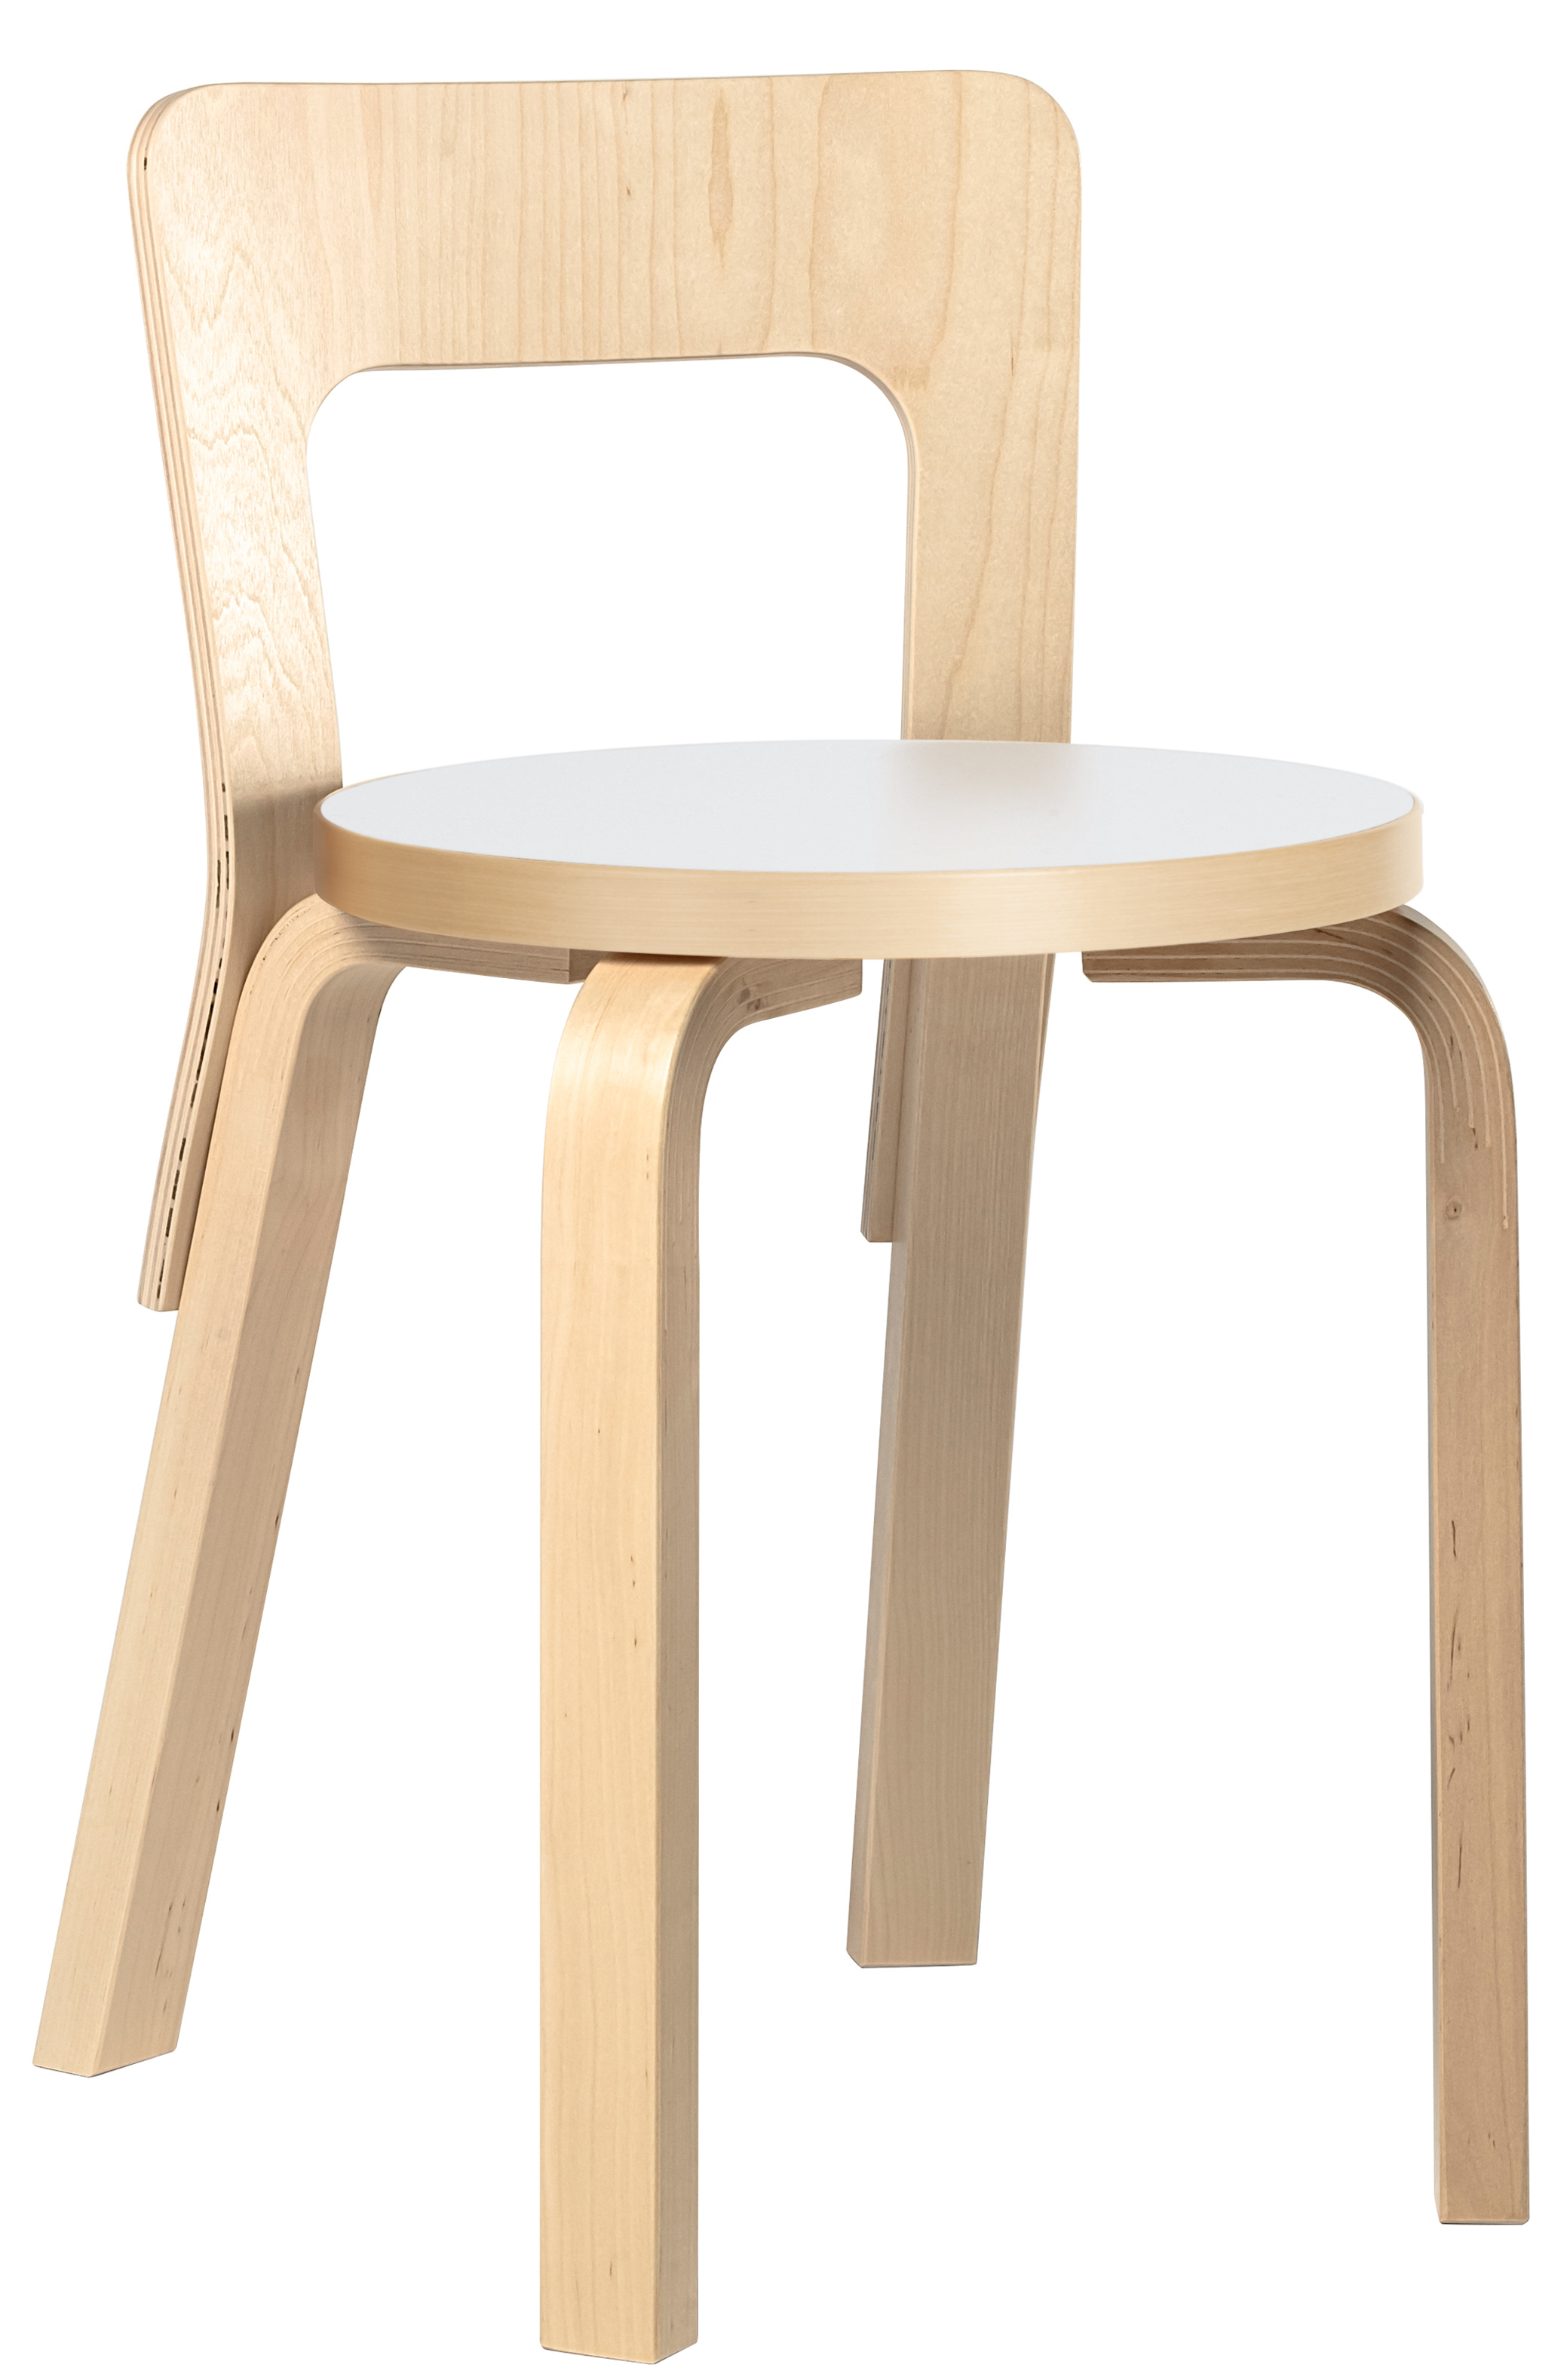 Outstanding Artek Chair 65 Alvar Aalto Cjindustries Chair Design For Home Cjindustriesco